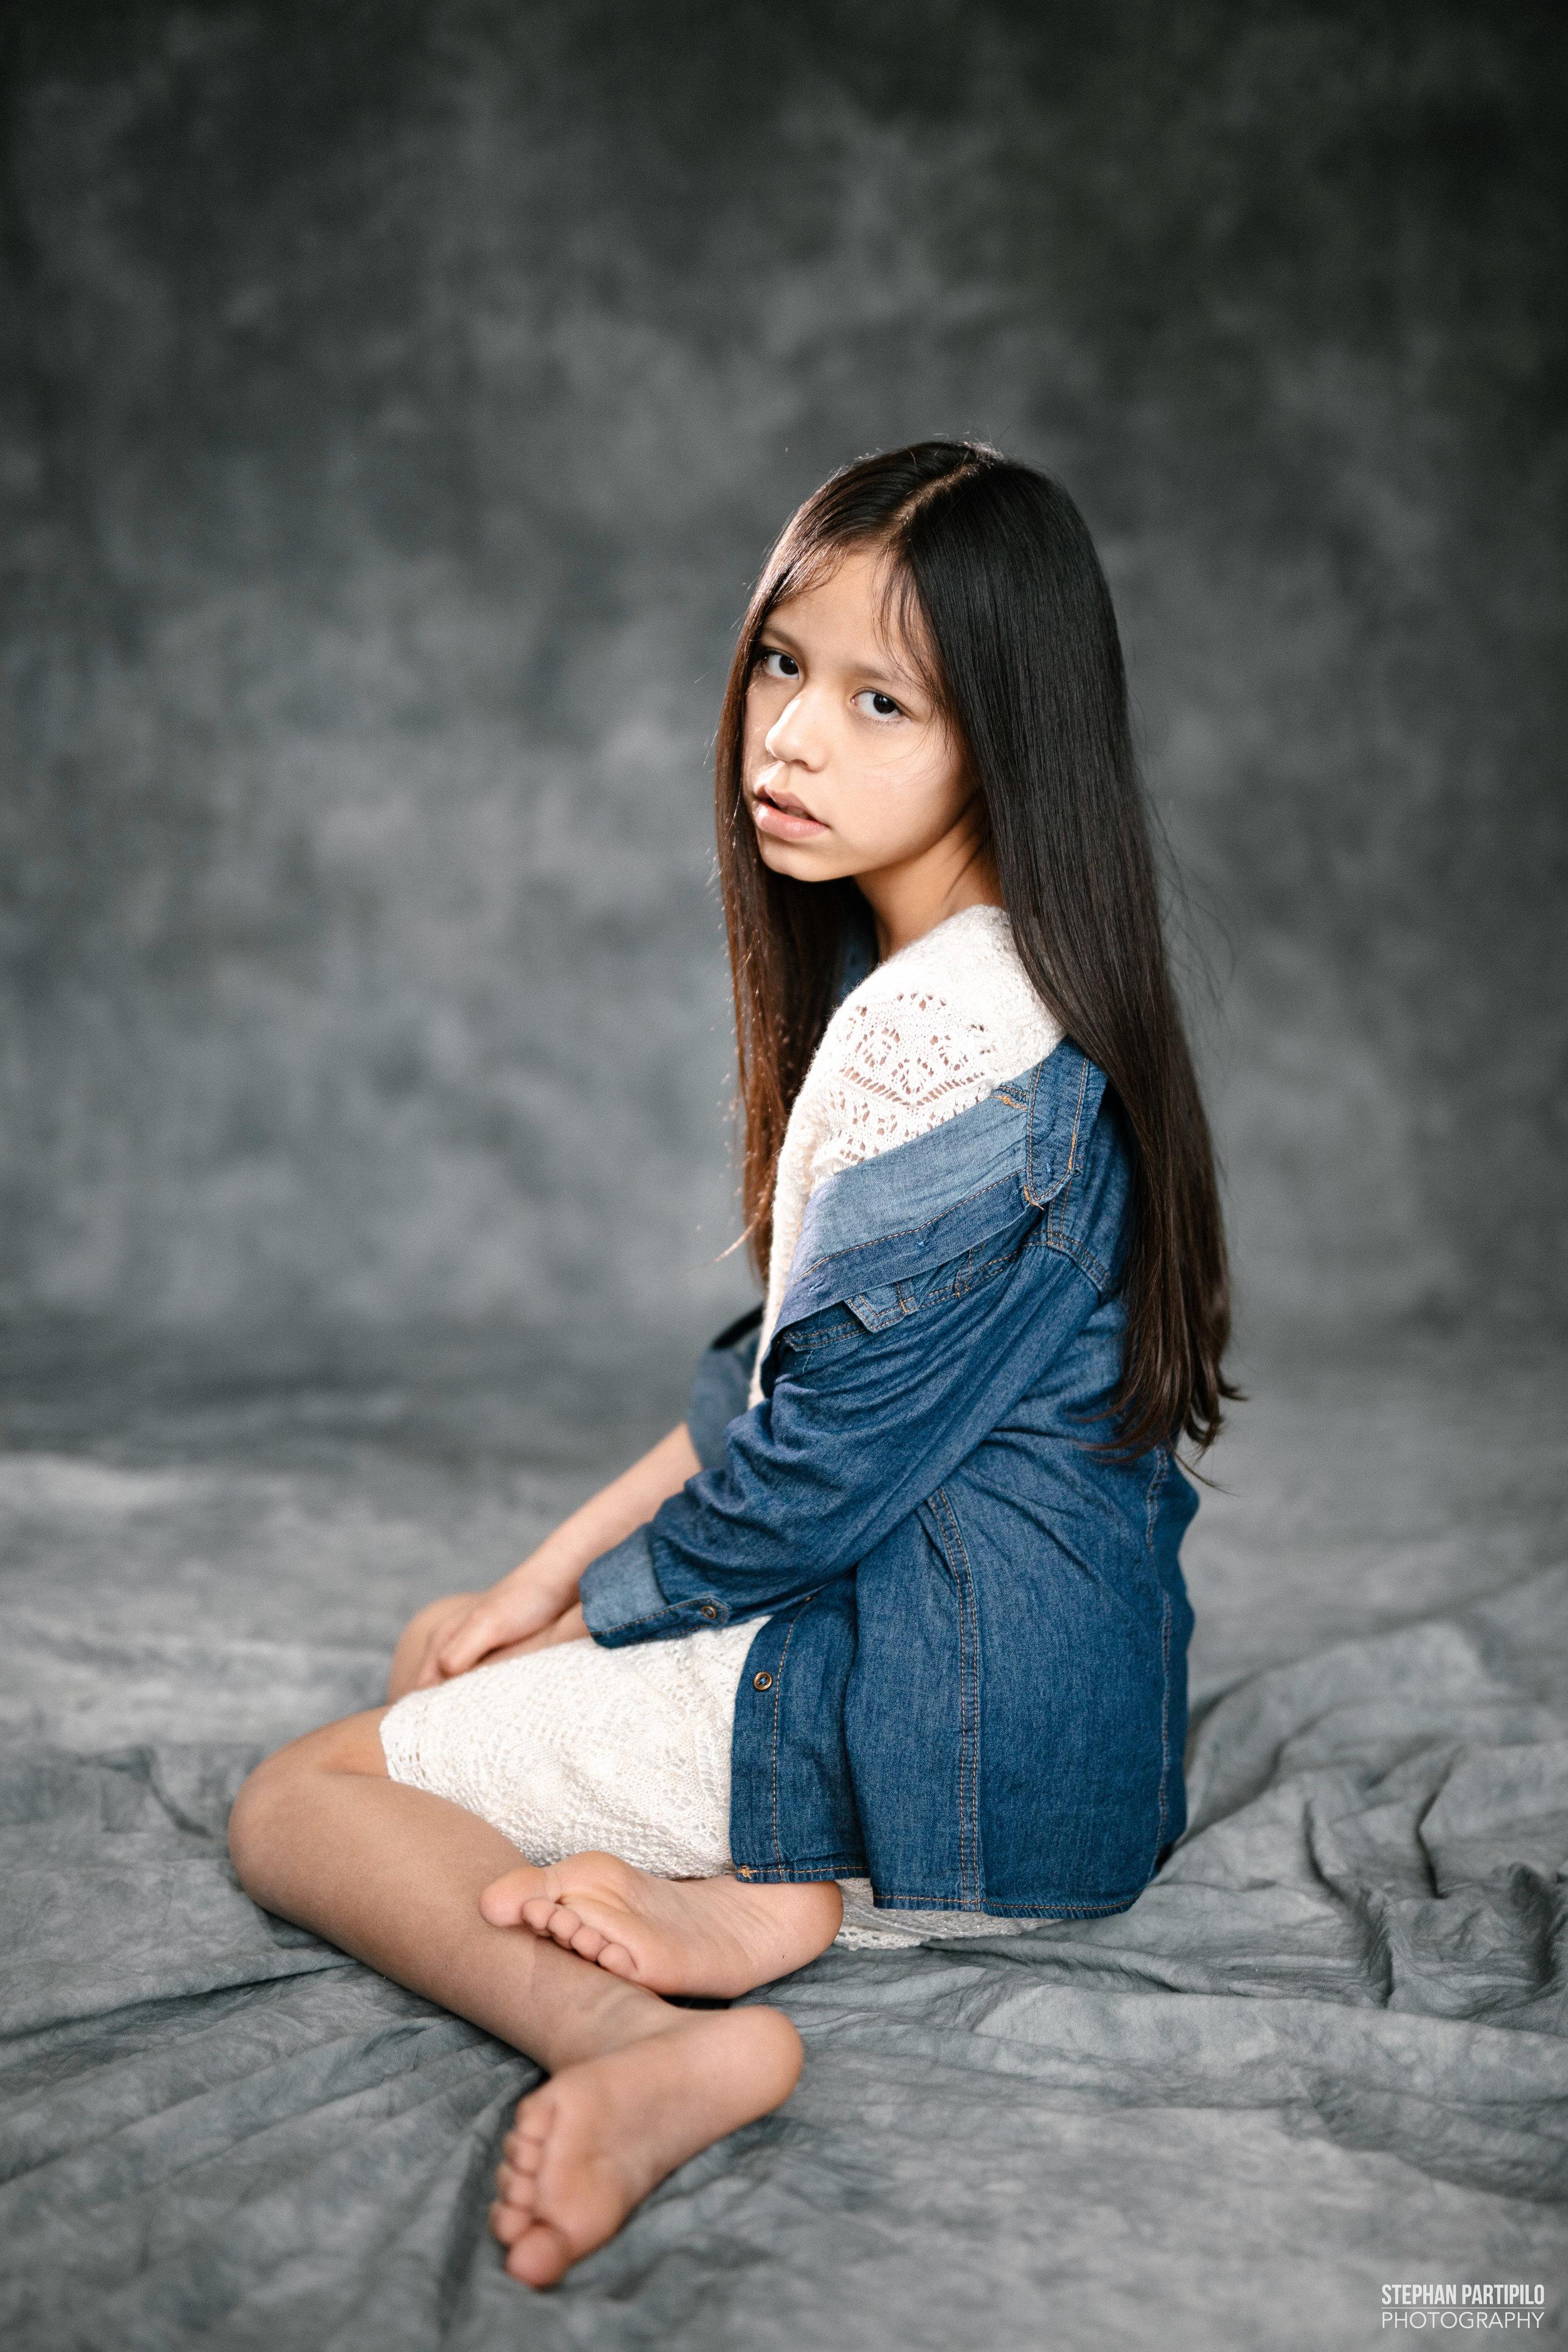 Marisol Child Model PDX 2019 0G5A9462.jpg